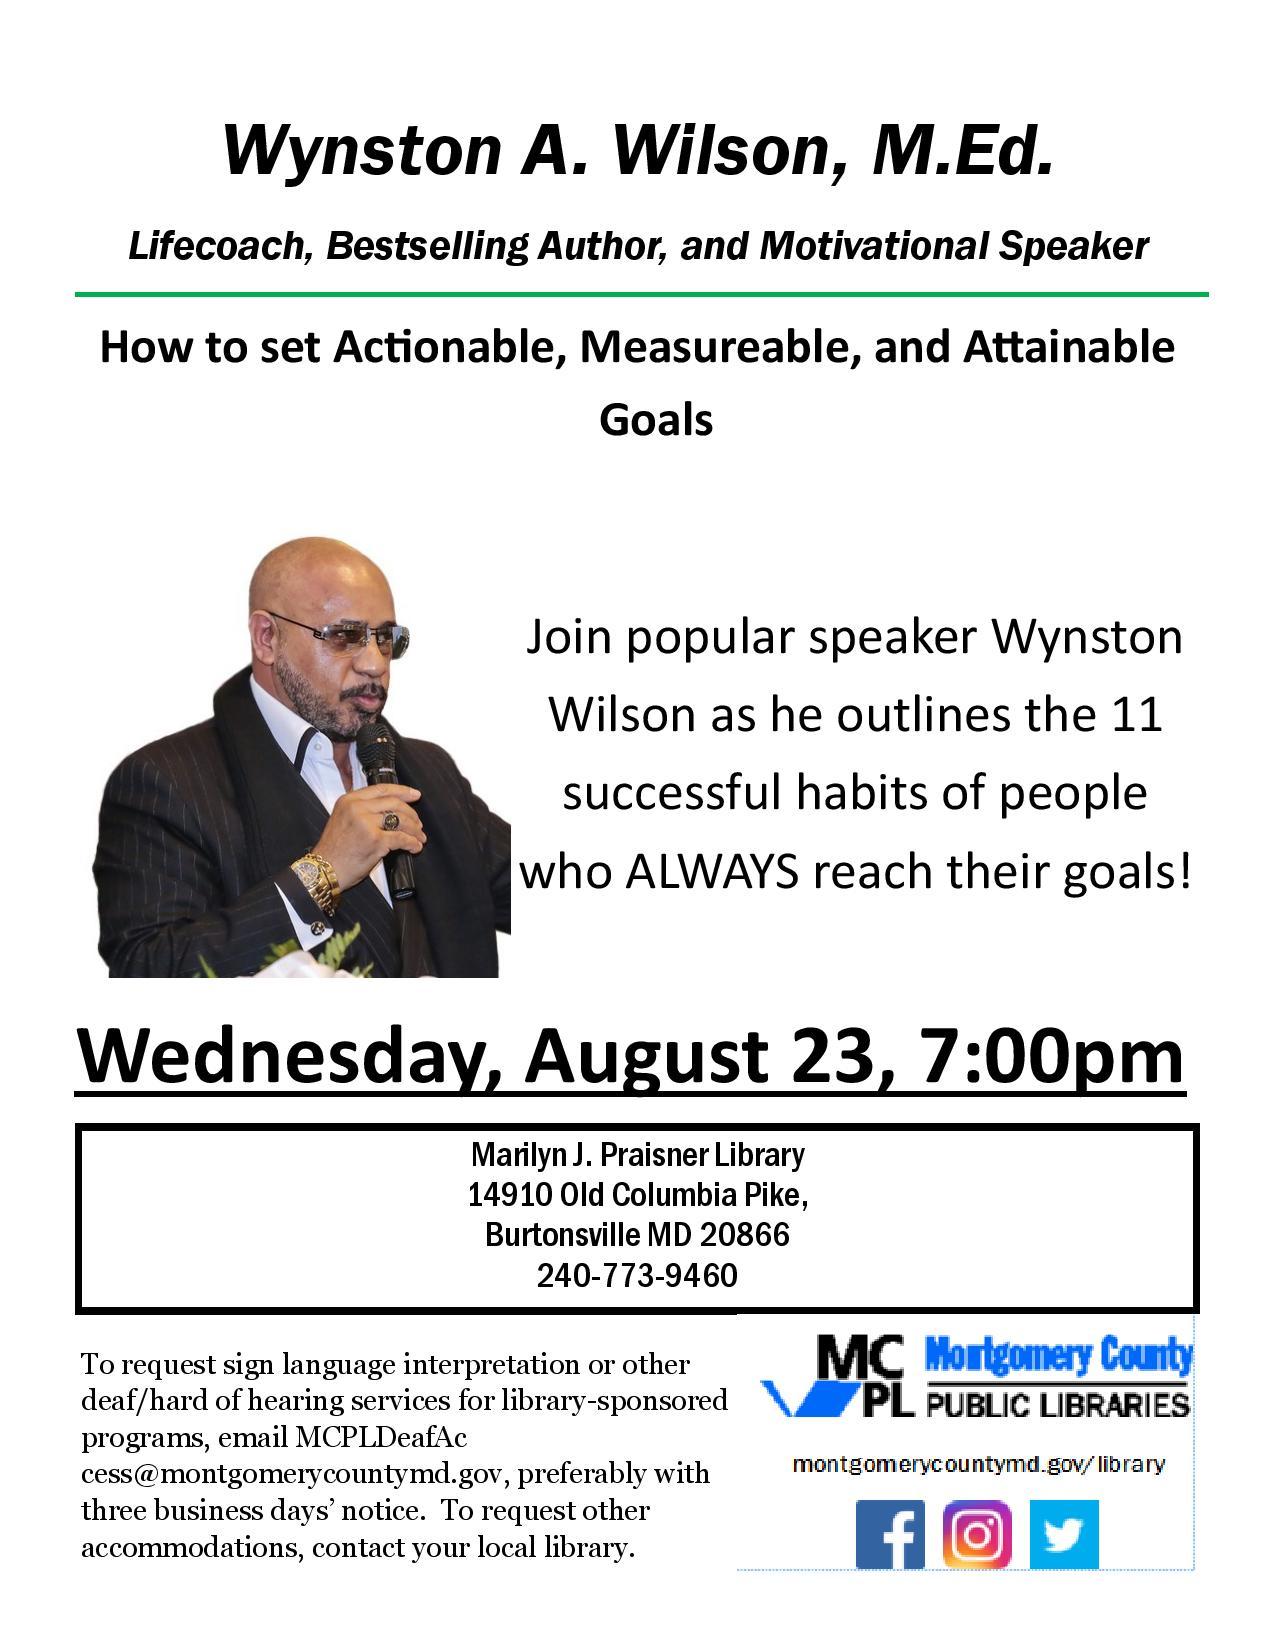 Aug23-wynston1wilson-page-001